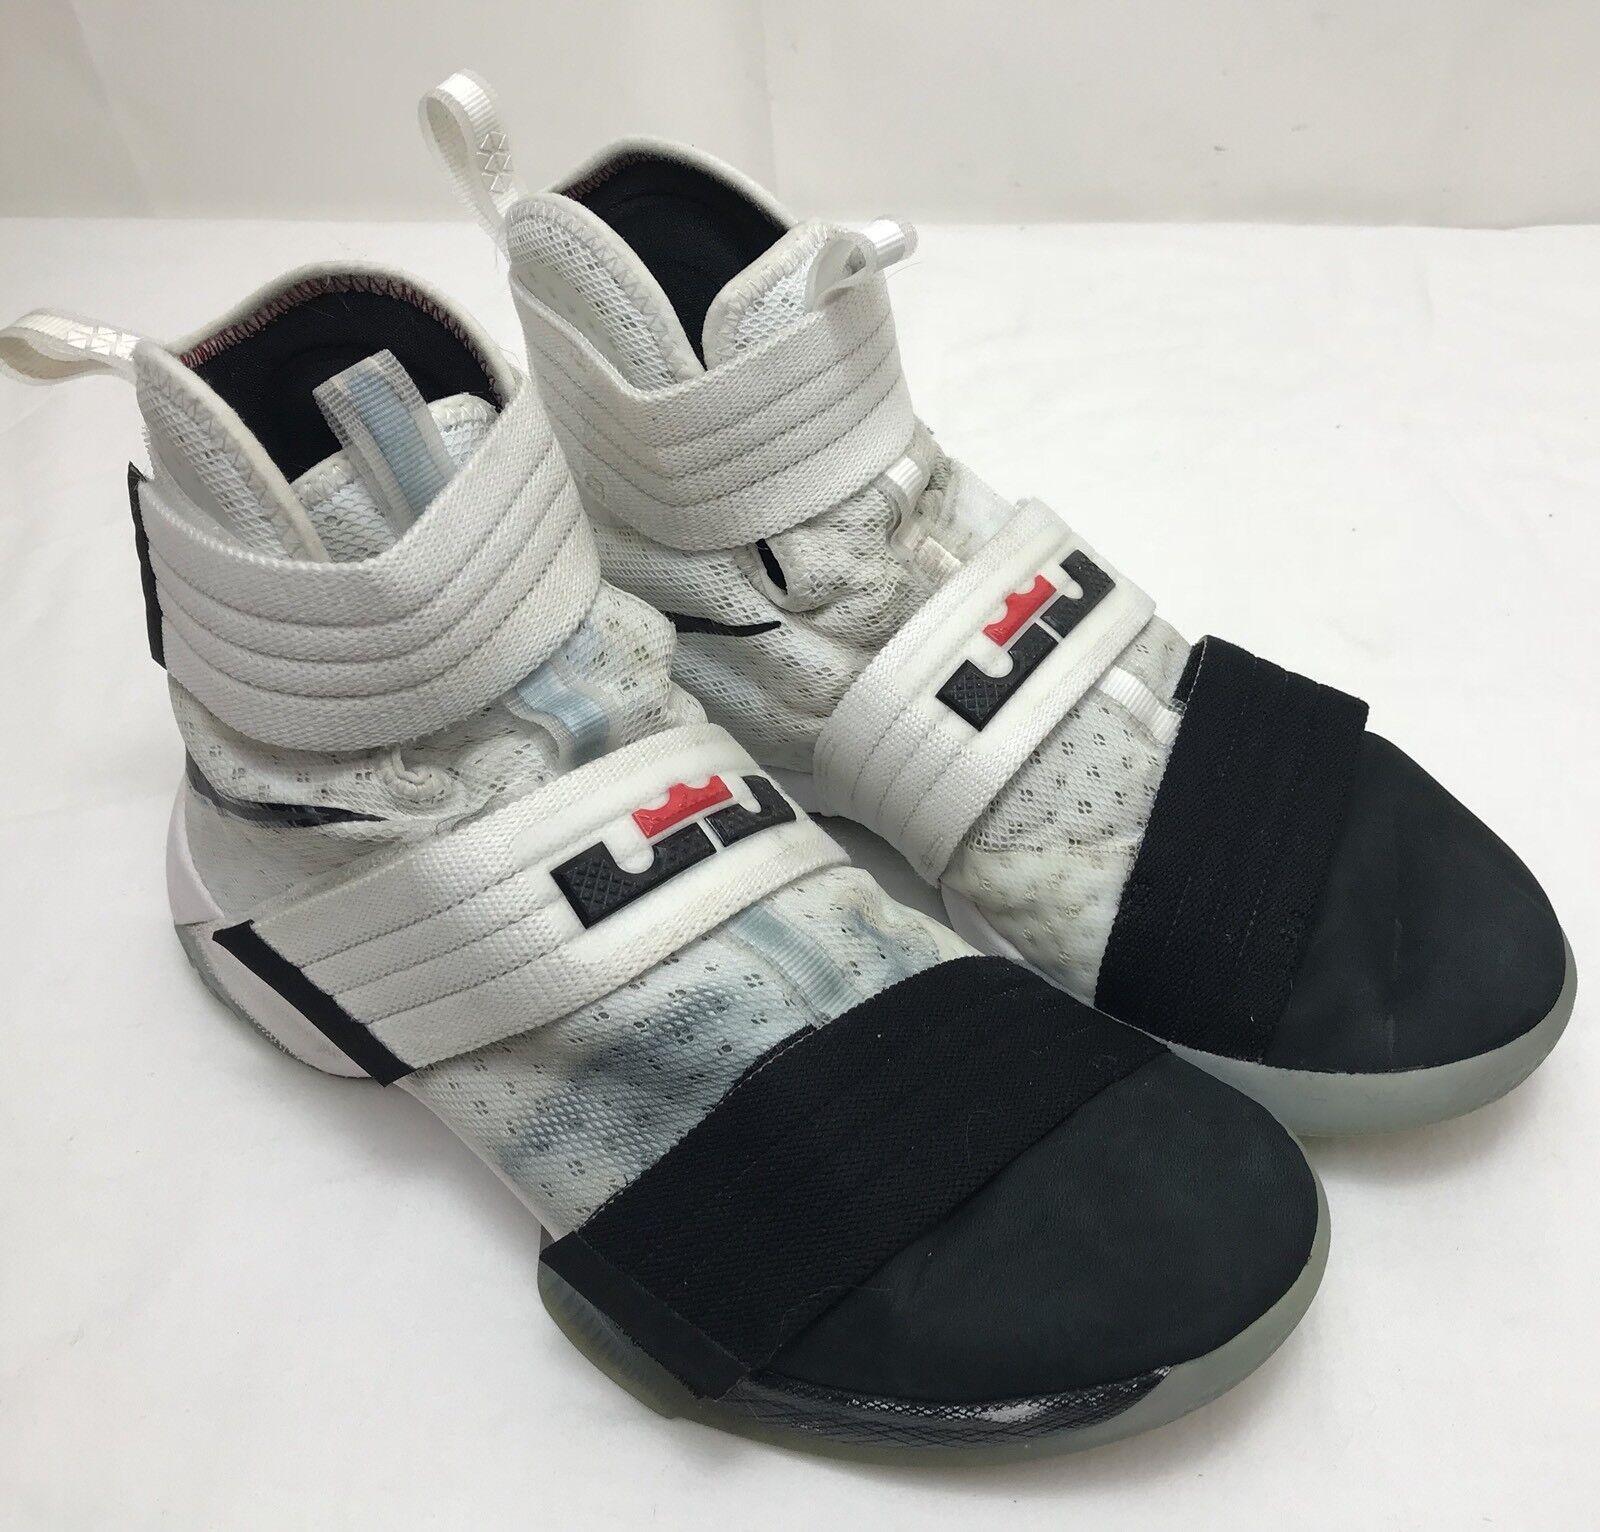 Uomo / nike lrj sx 16 / Uomo 17 lebron james soldato nero / bianco scarpe taglia 9 b4c72b